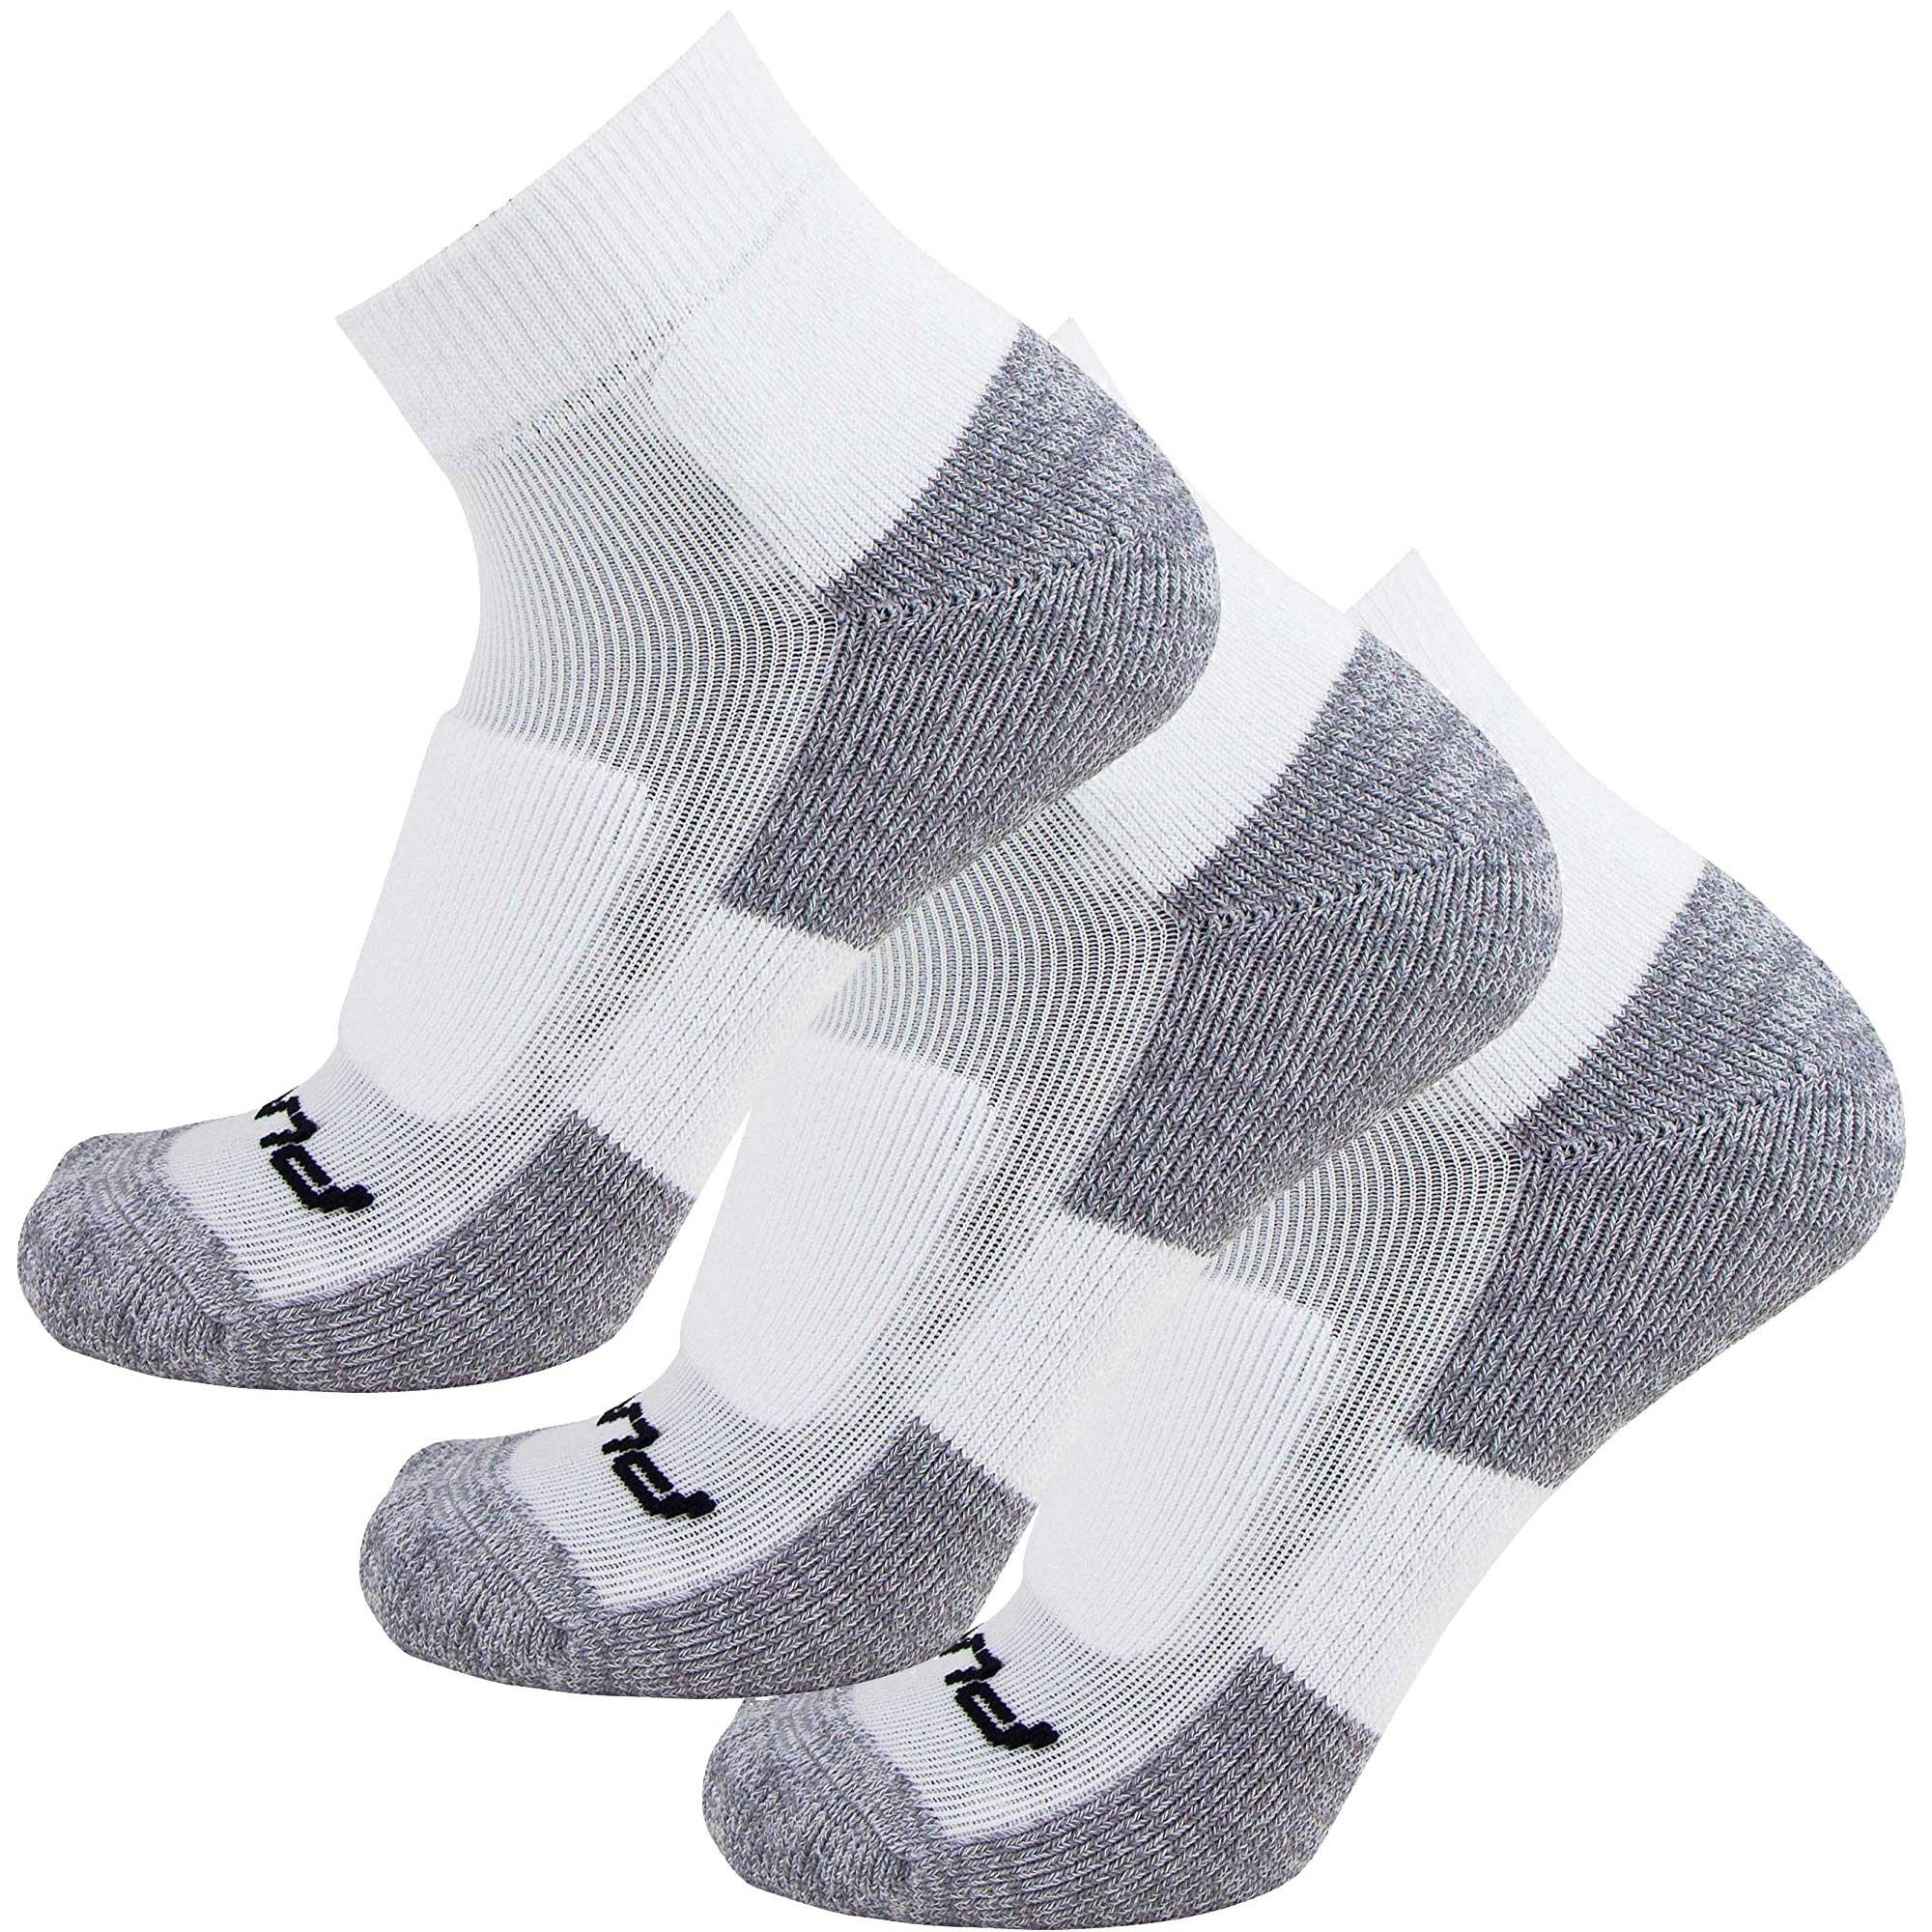 Comfort Padded Walking Socks – Everyday Ultra-Comfortable Anti-Blister Walker Socks – Also use for Jogging, Running, Sports (L/XL, White - 3 Pack)